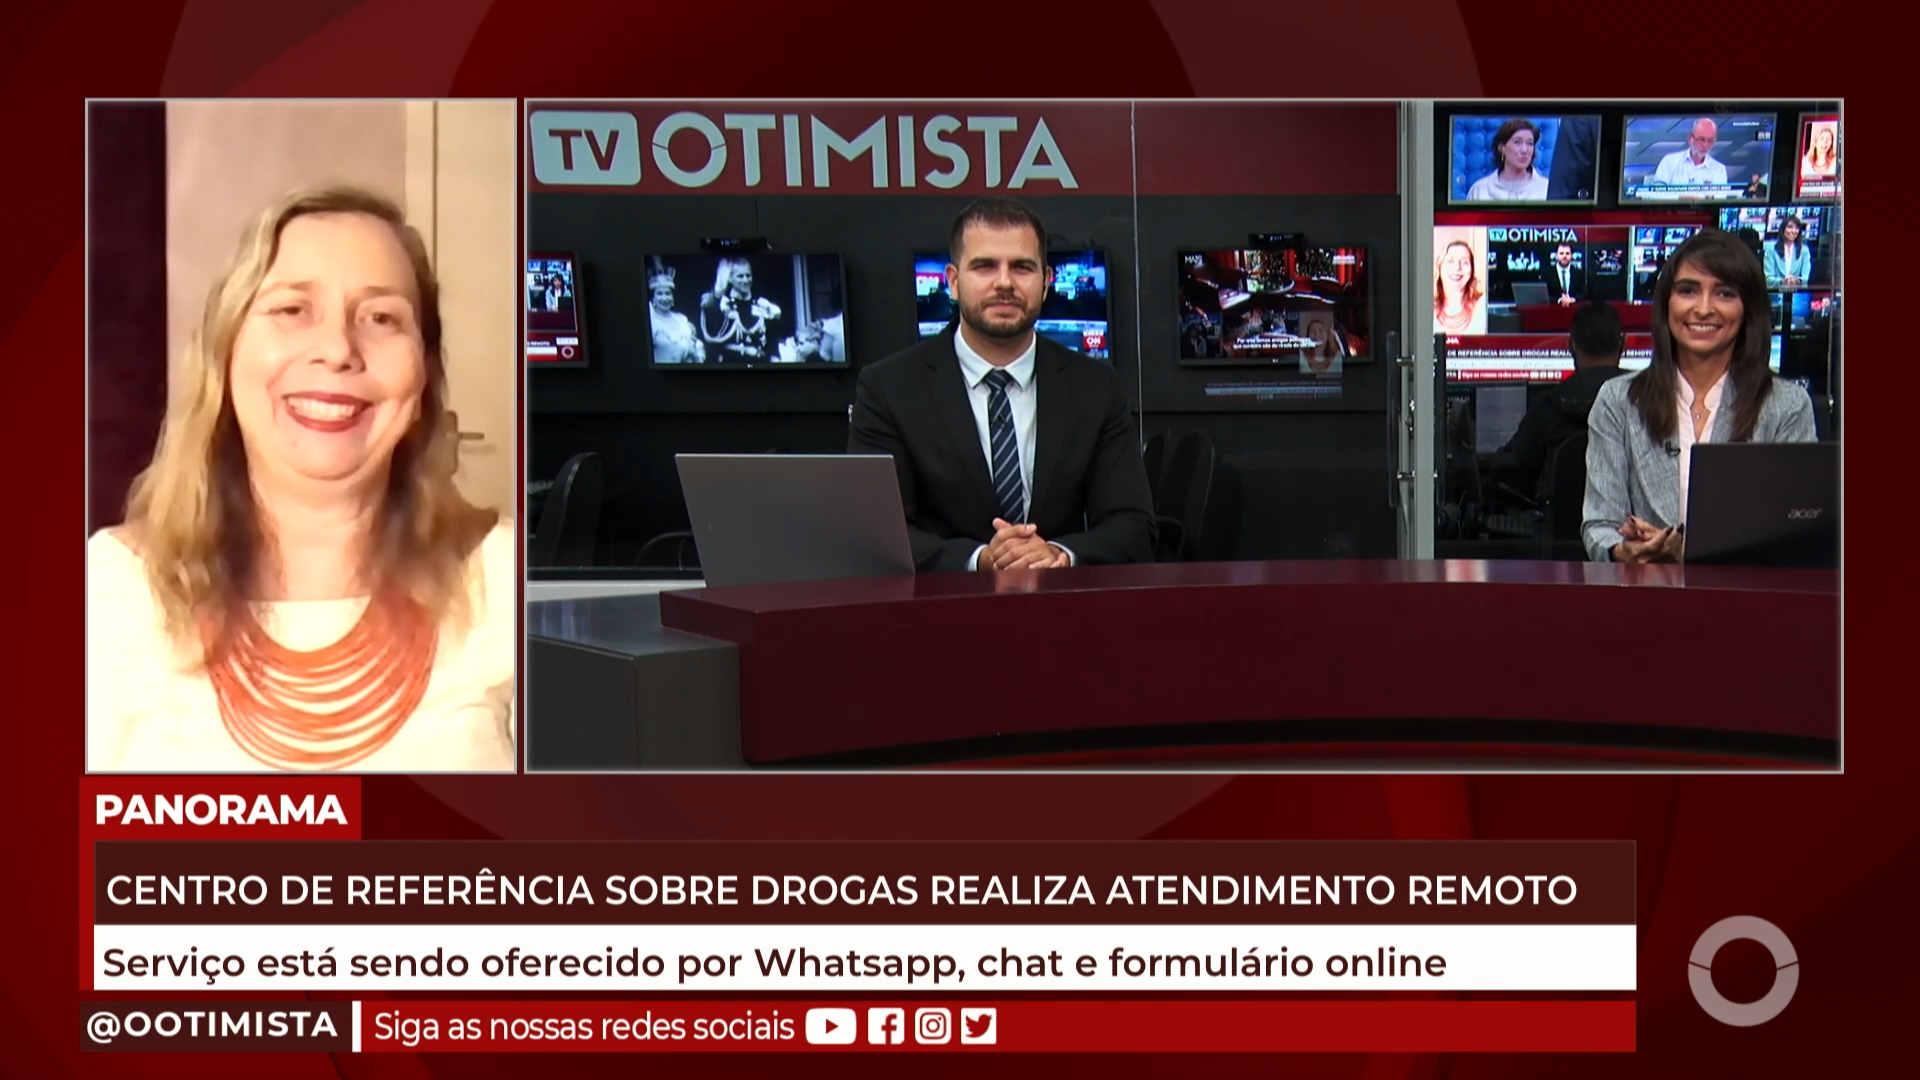 Centro de referencia sobre drogas realiza atendimento remoto